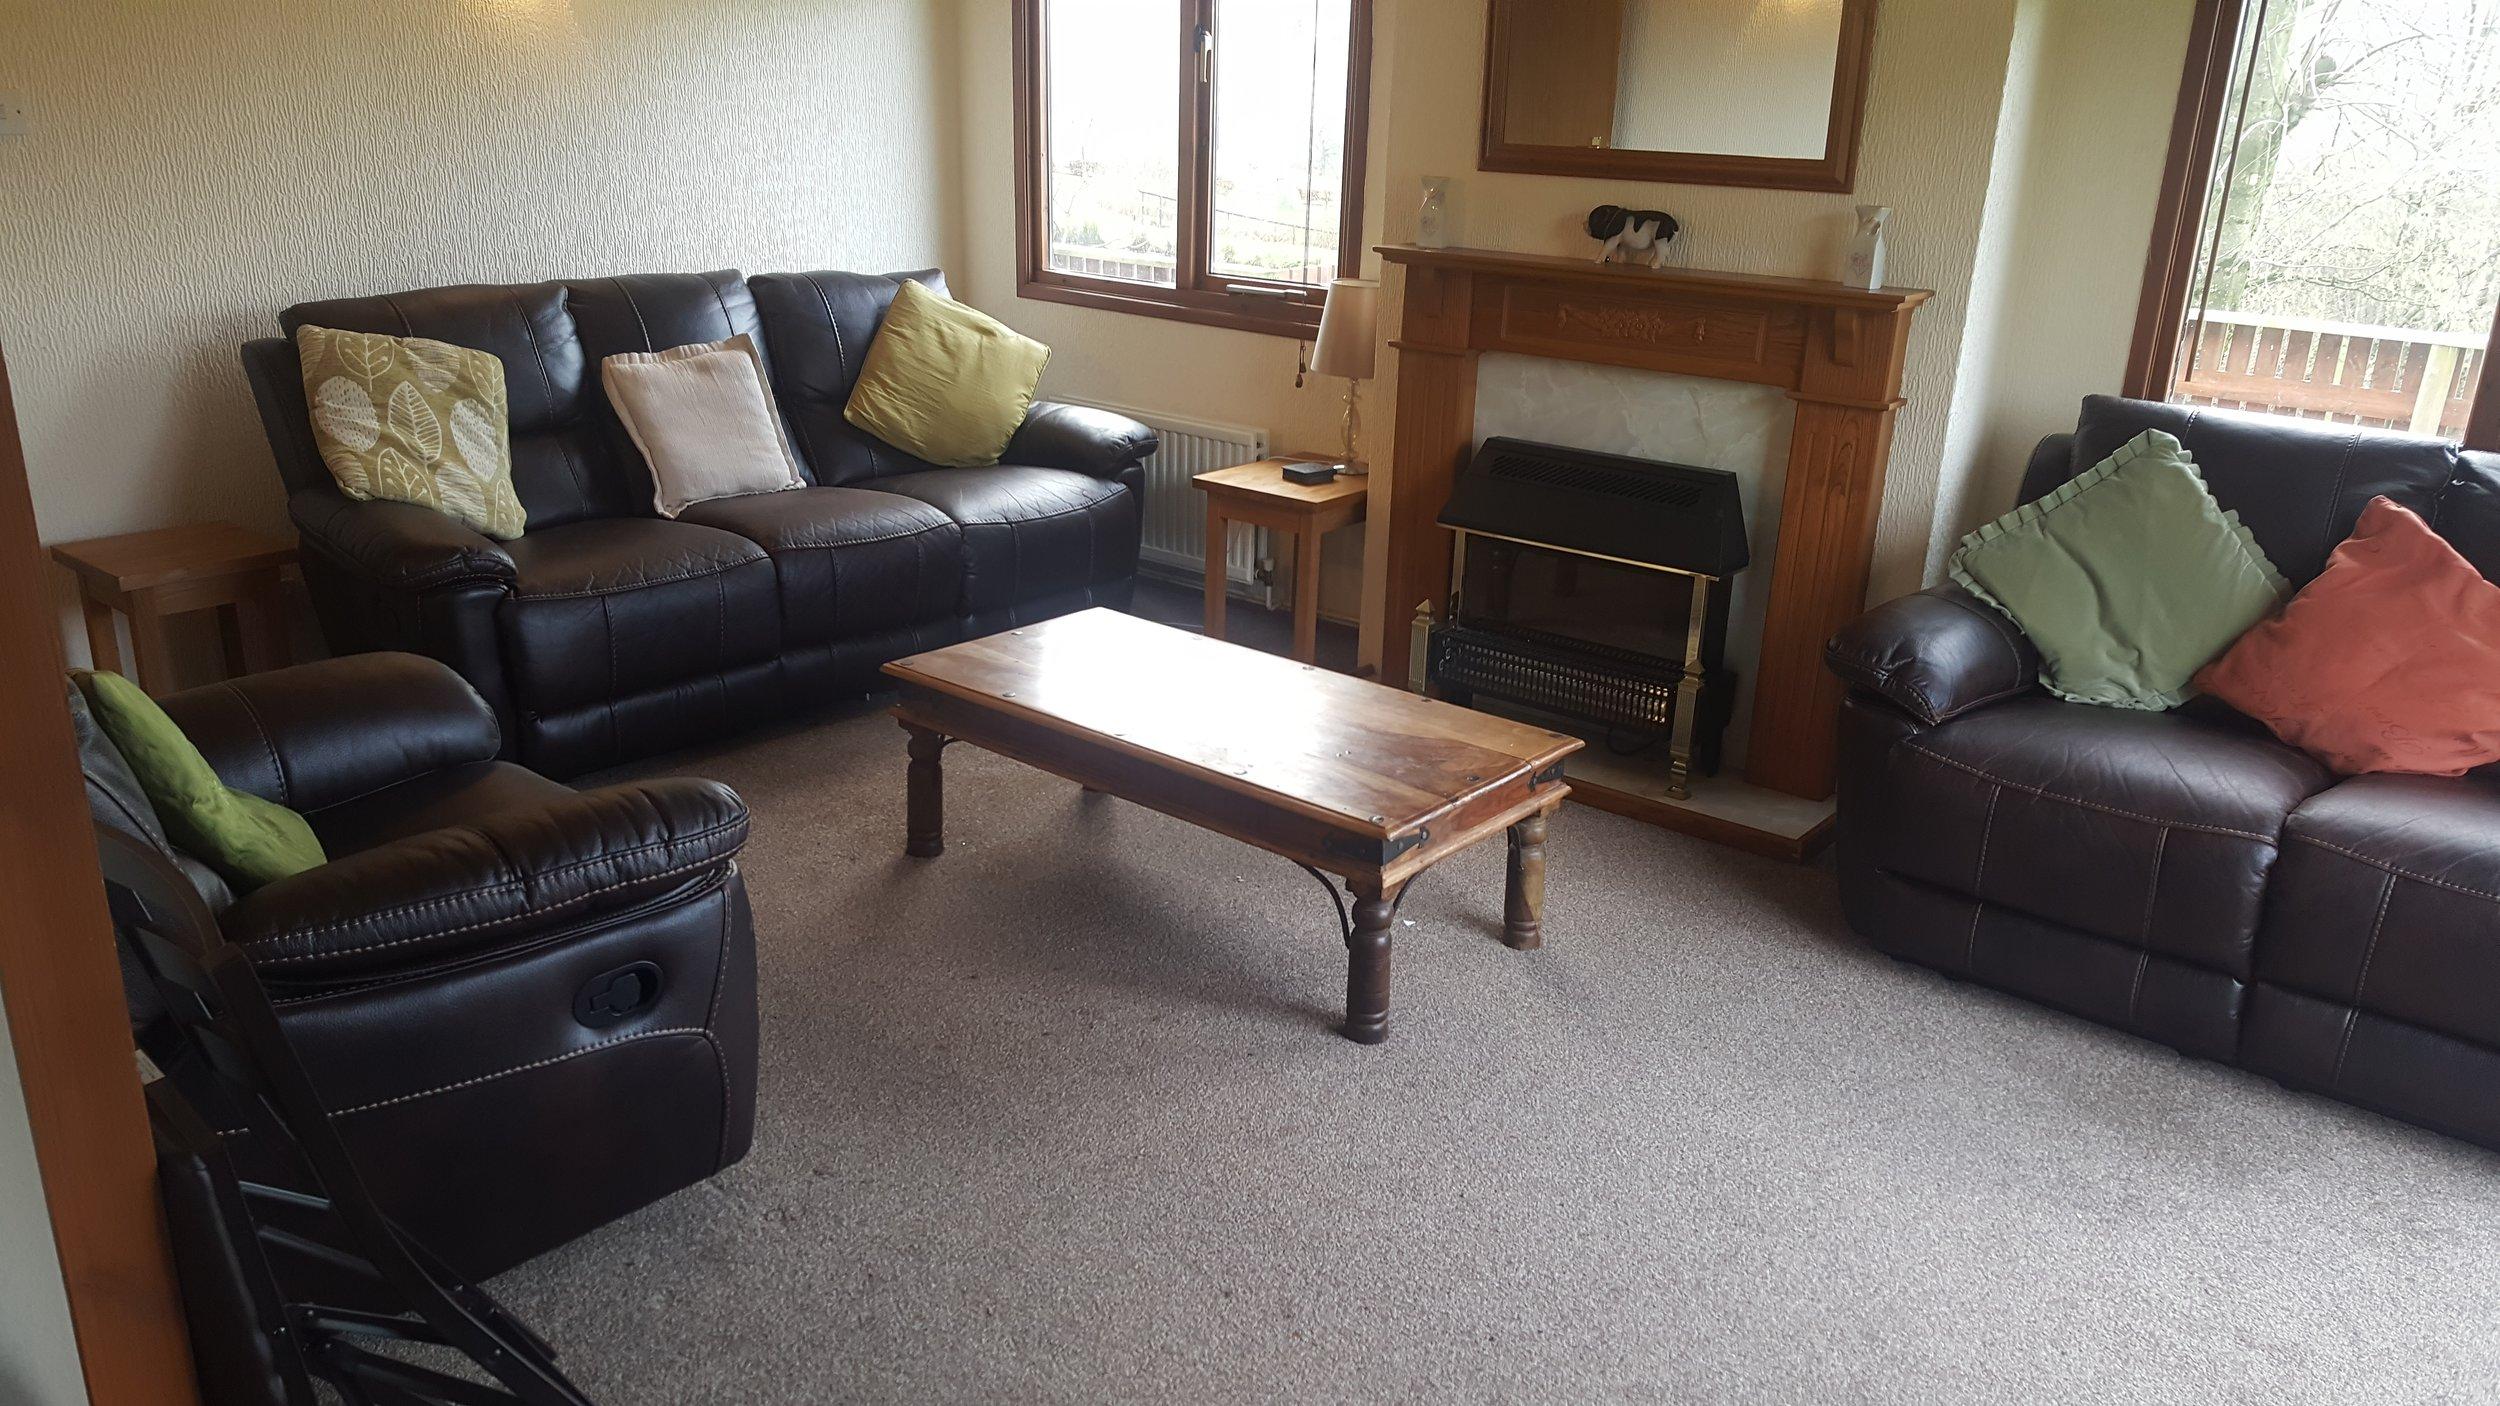 Living Room - Lodge Lorton Vale Caravans lortonvalecaravans.co.uk